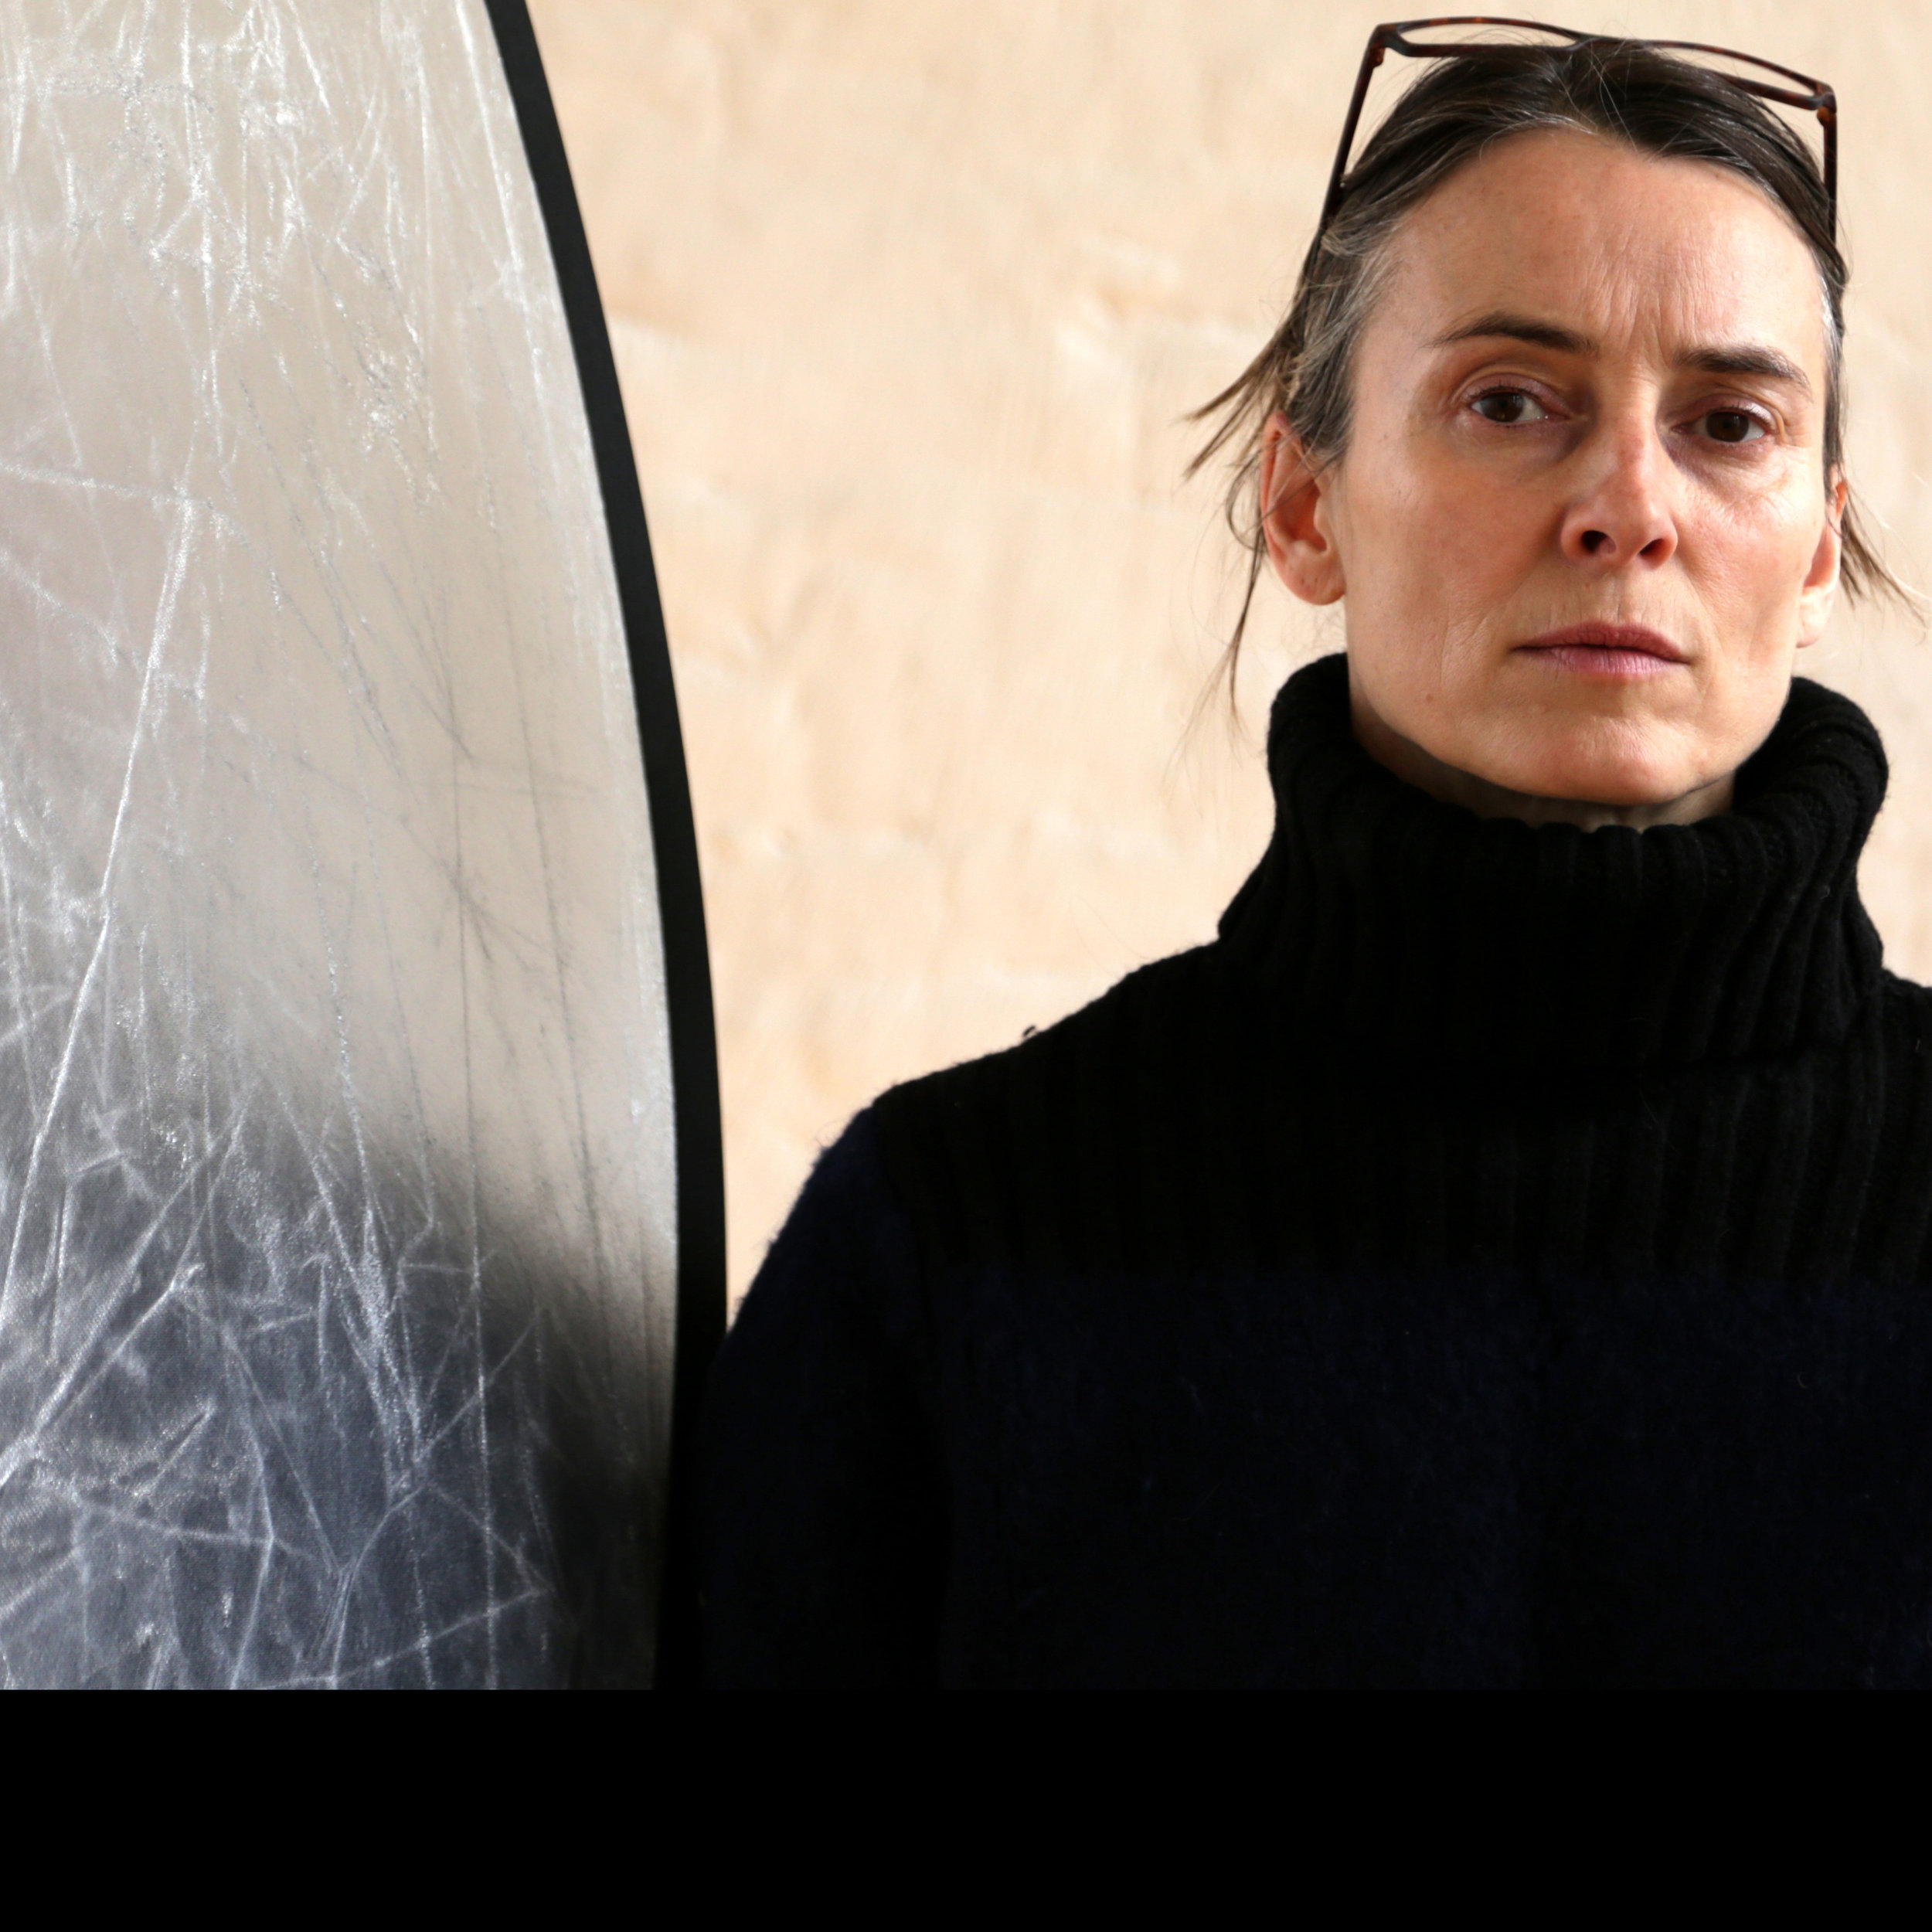 ALEXANDRA HUNGERBUHLER - PROJECT COORDINATOR